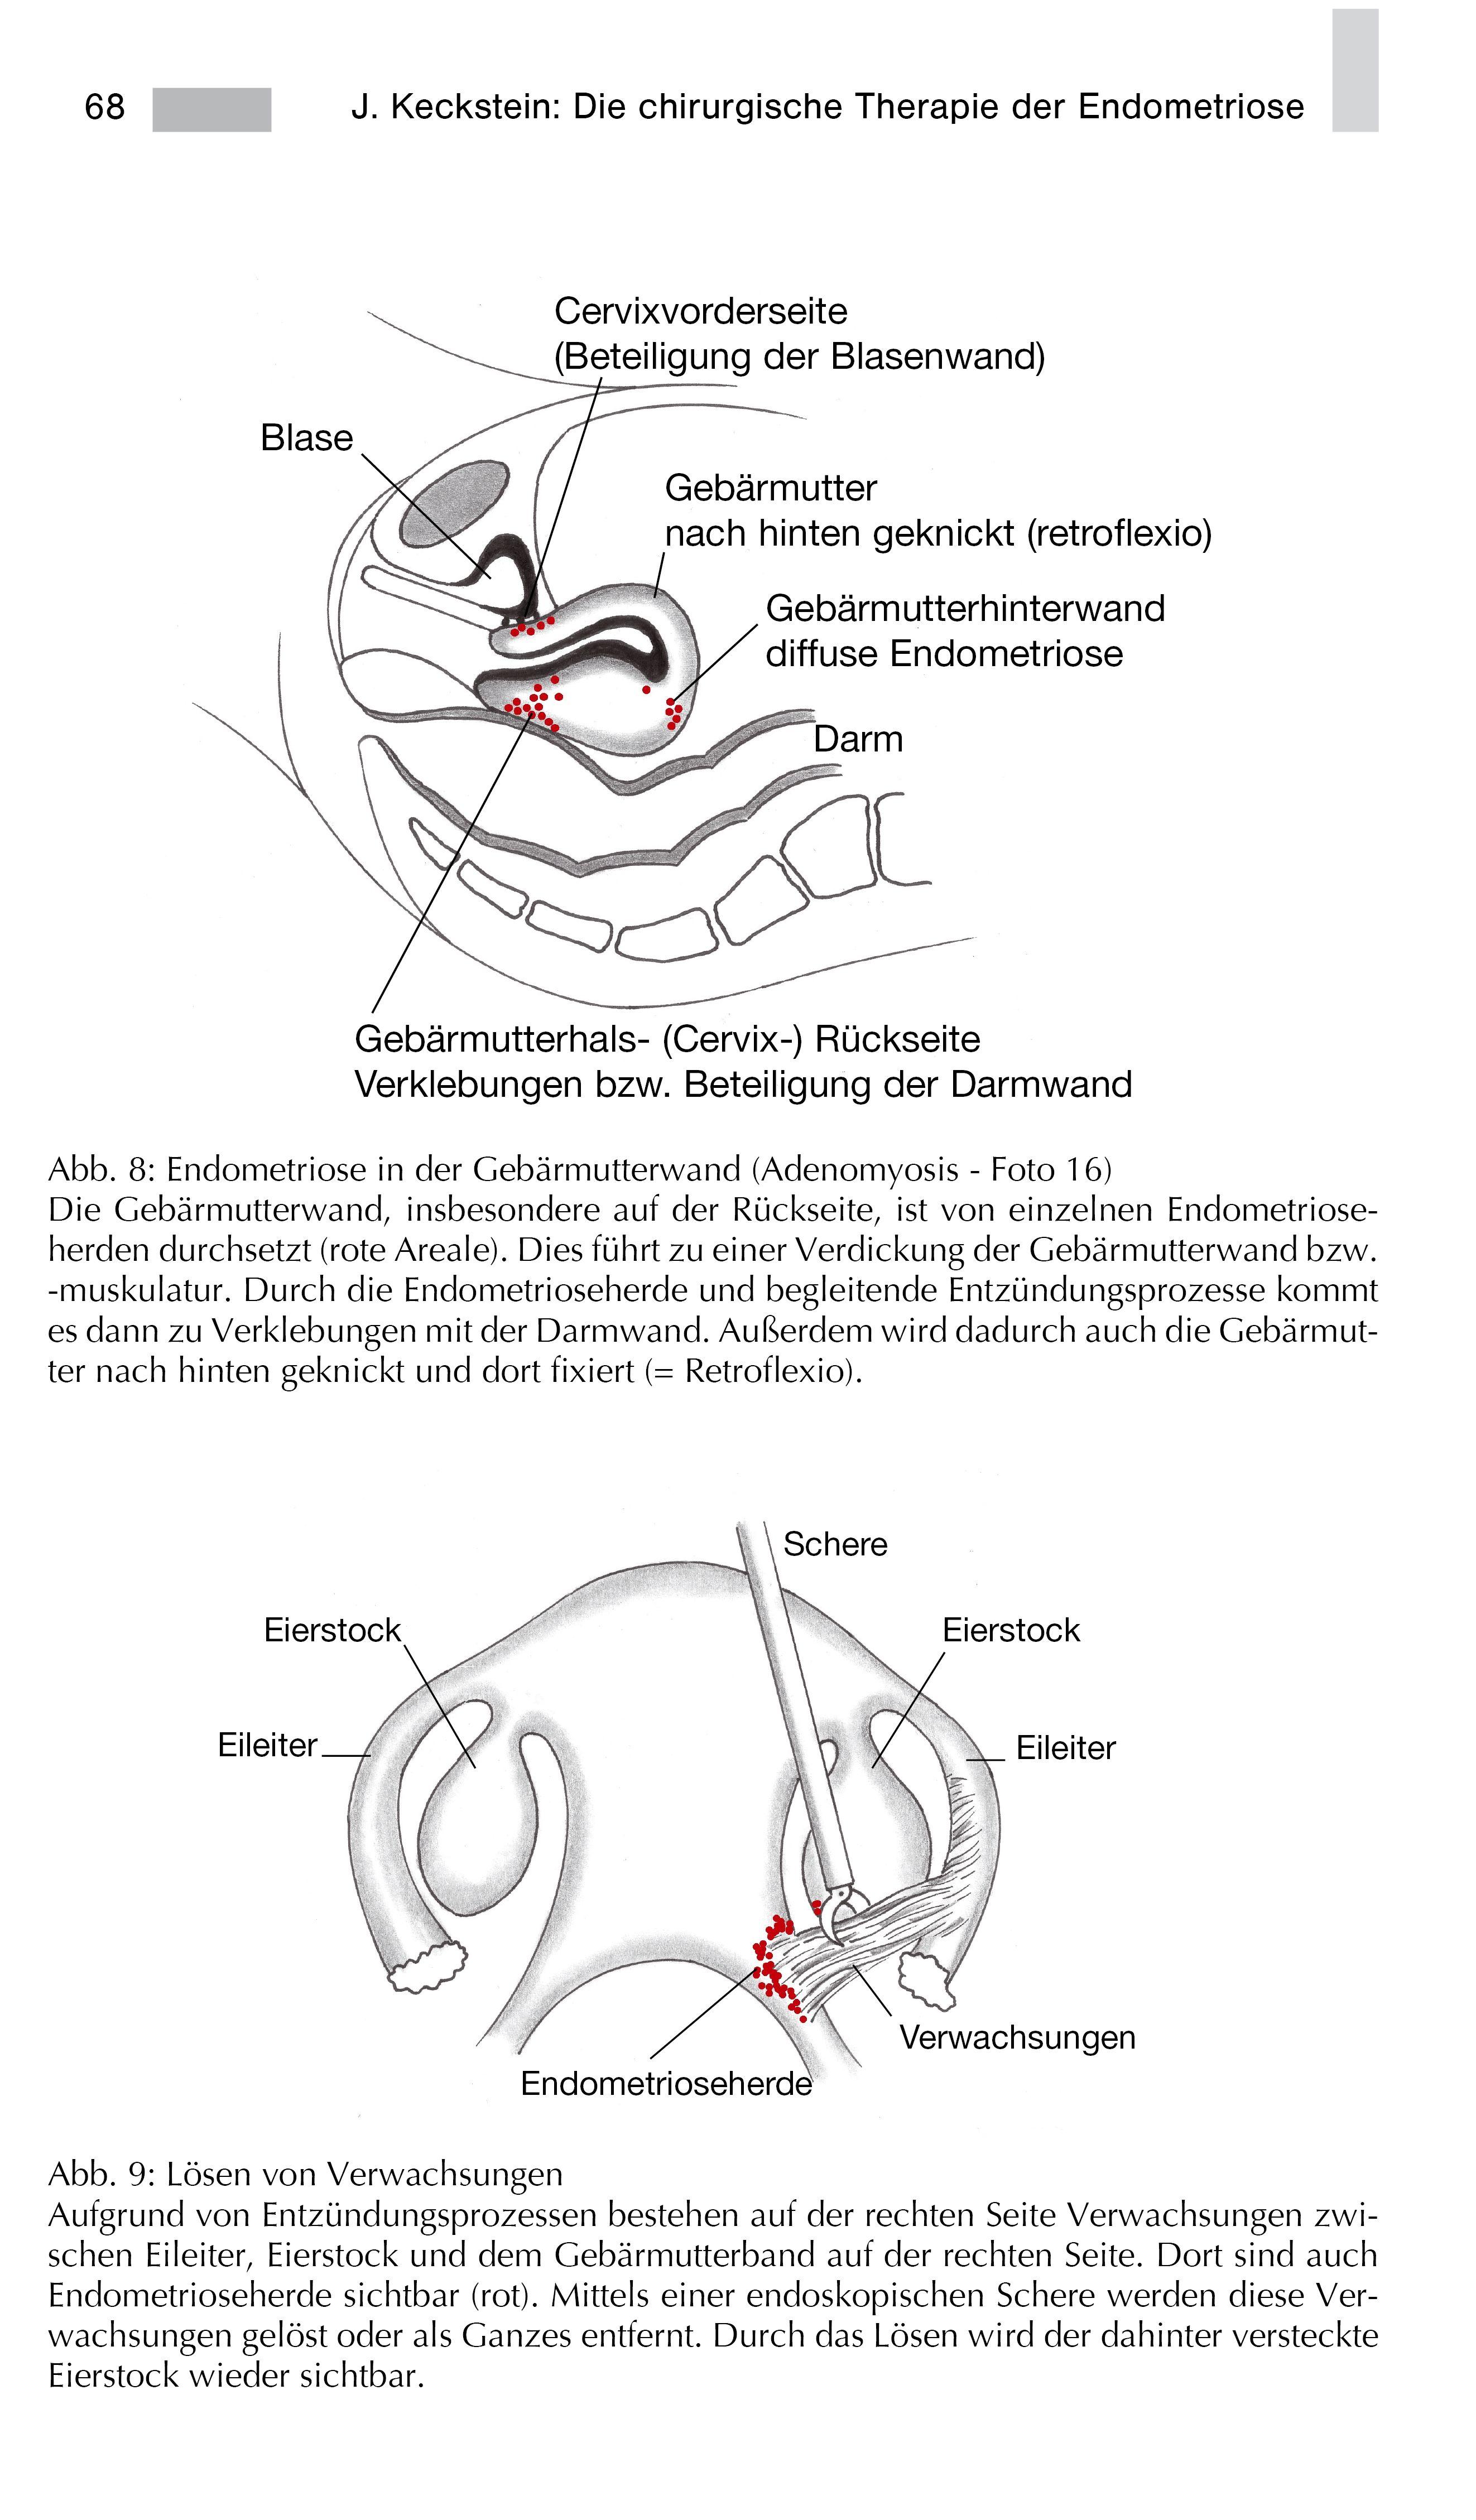 Hinten geknickte gebärmutter nach Nach hinten